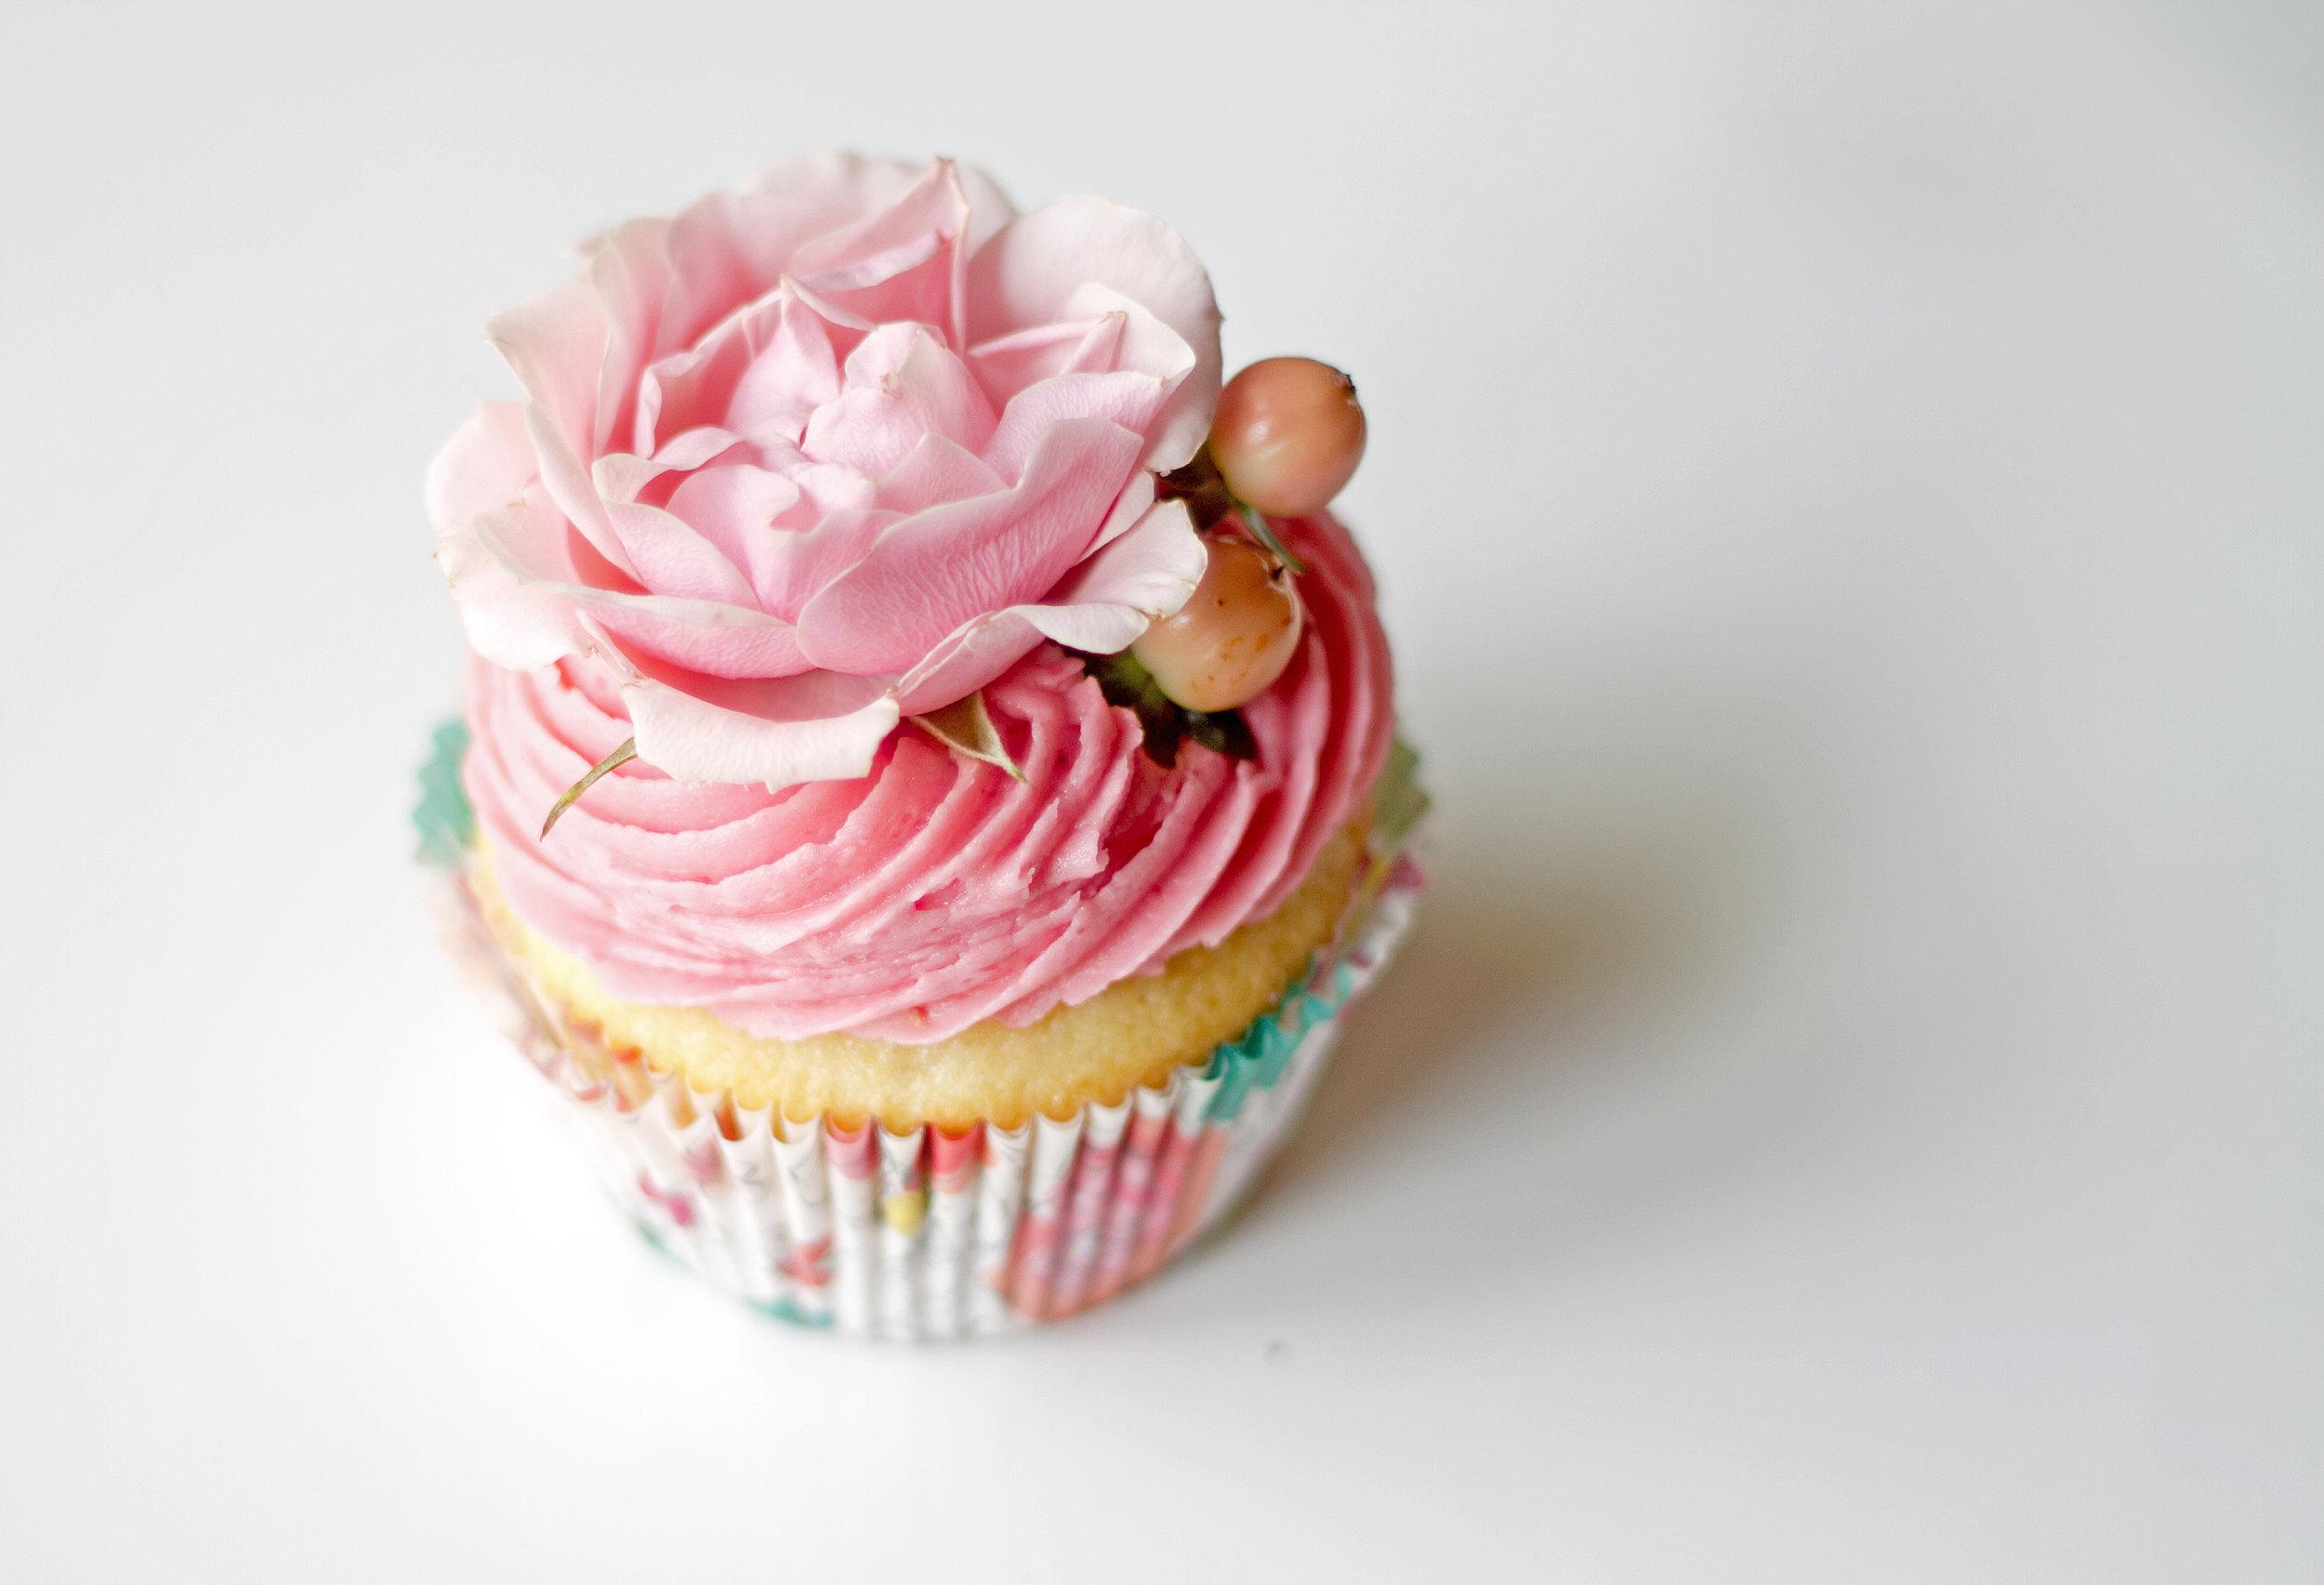 Custom cakes windsor ontartio; baptism cakes; wedding cakes; custom made cake; best cake in windsor; cake shop windsor; birthday cake windsor; best birthday cakes; chocolate cake; cupcakes; windsor cupcakes; best cupcakes in windsor; custom-made designs; themed cakes; floral cakes; layered cakes; windsor ontario cake shop; anniversary cake